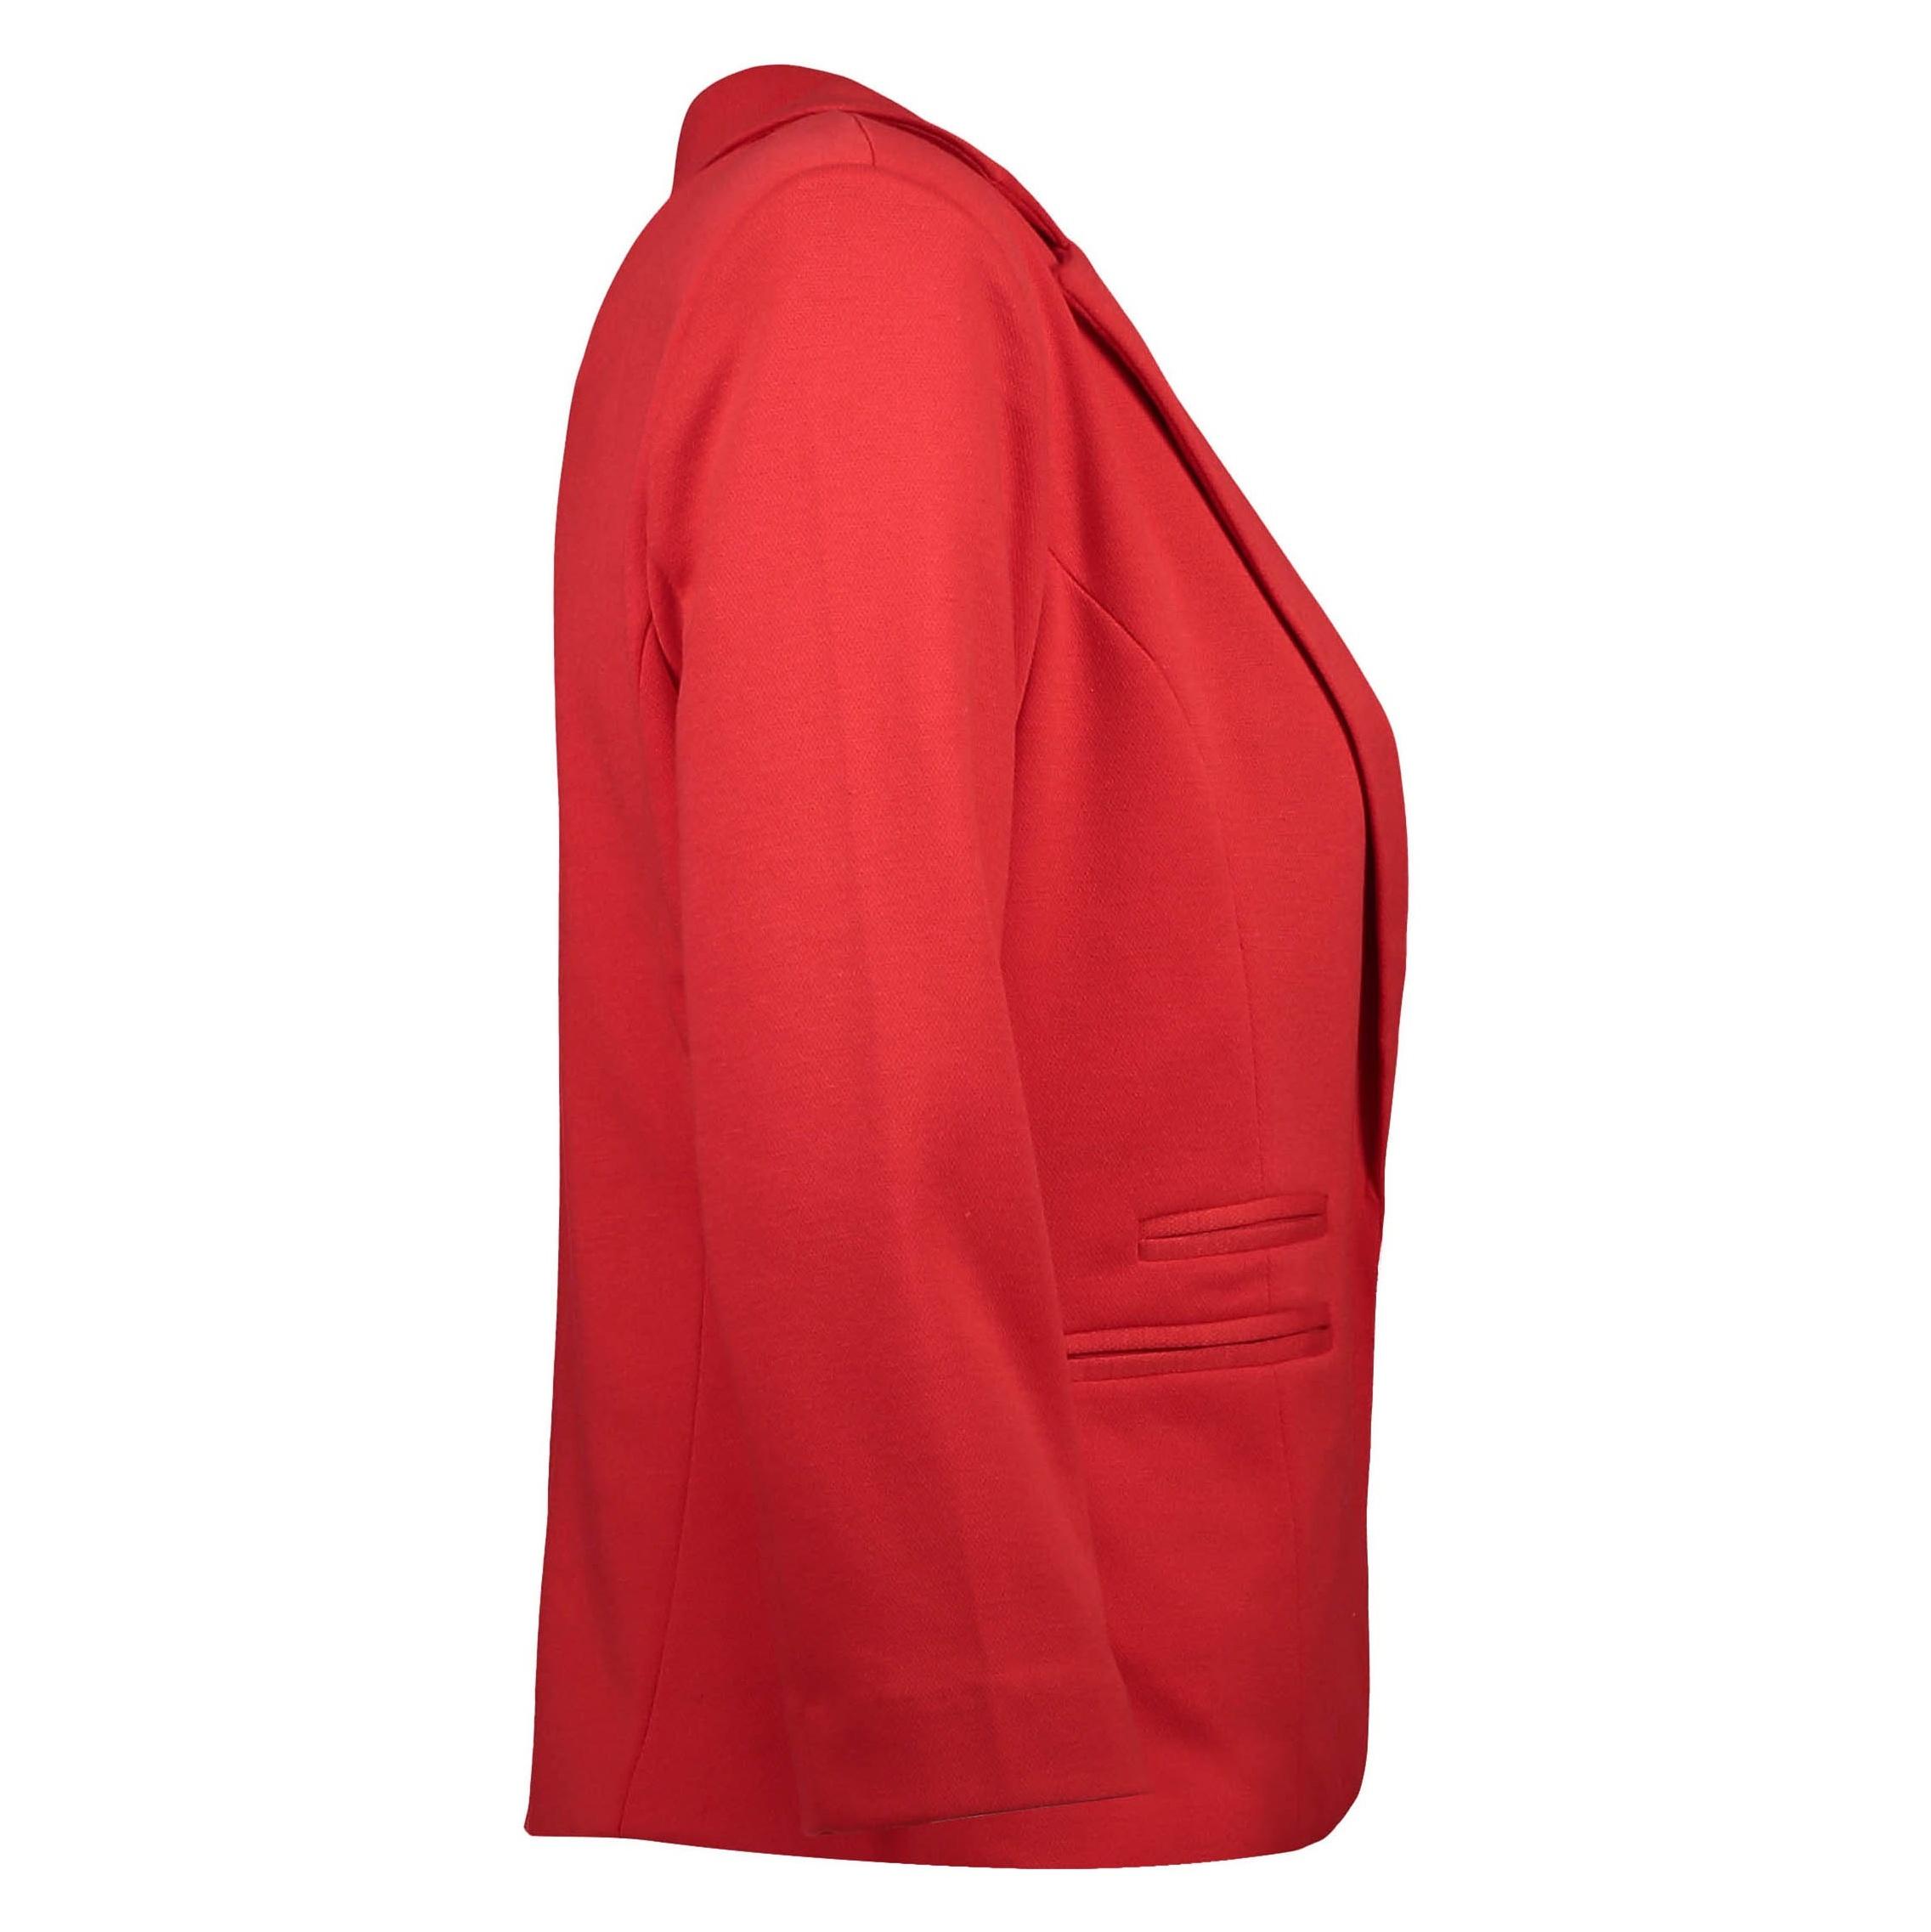 کت کوتاه زنانه - جنیفر - قرمز - 3